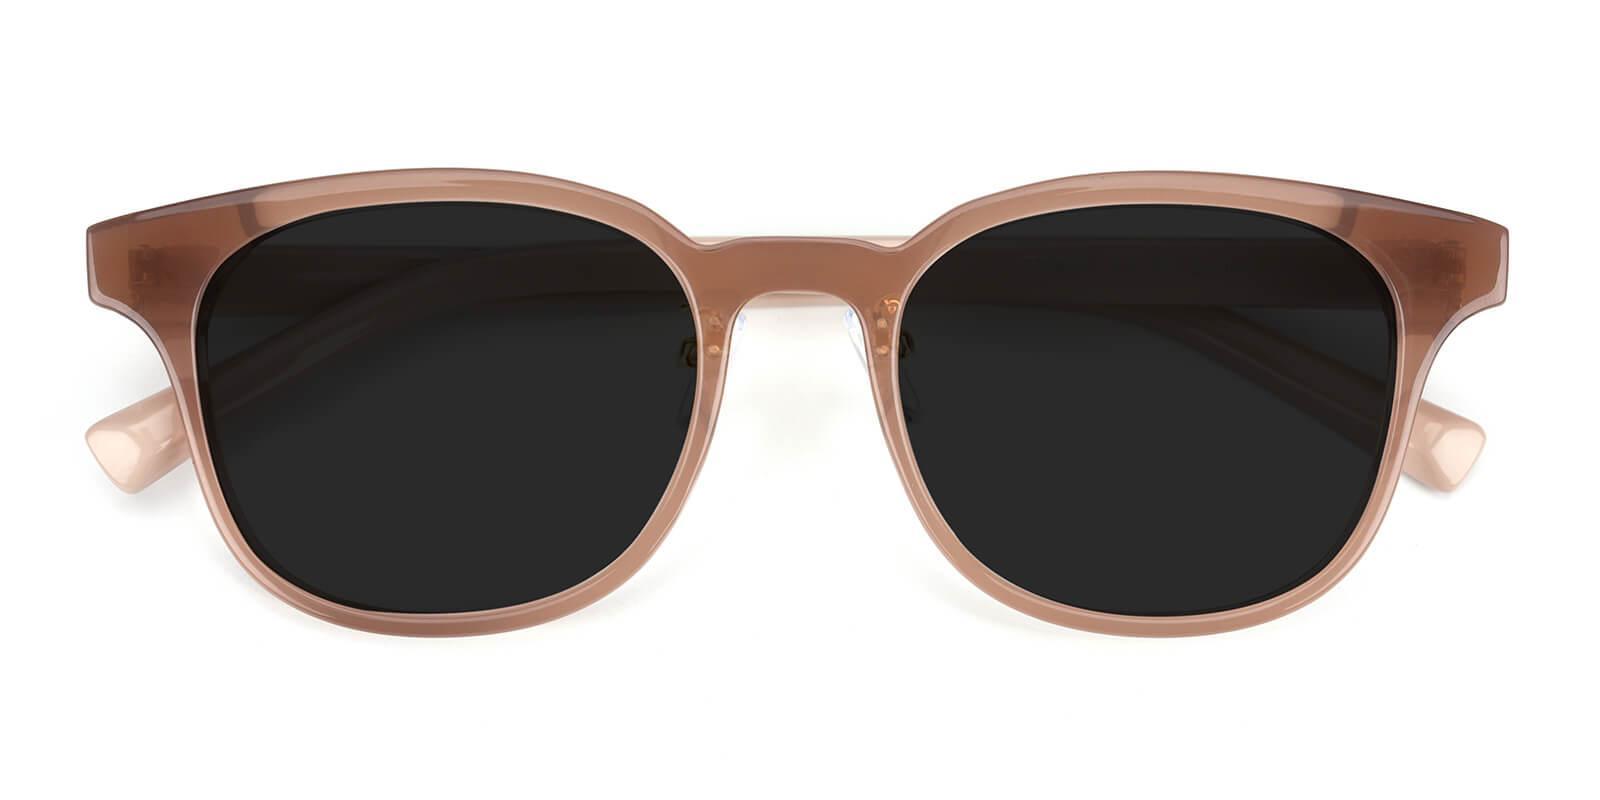 Soyok-Brown-Square / Cat-TR-Sunglasses-detail